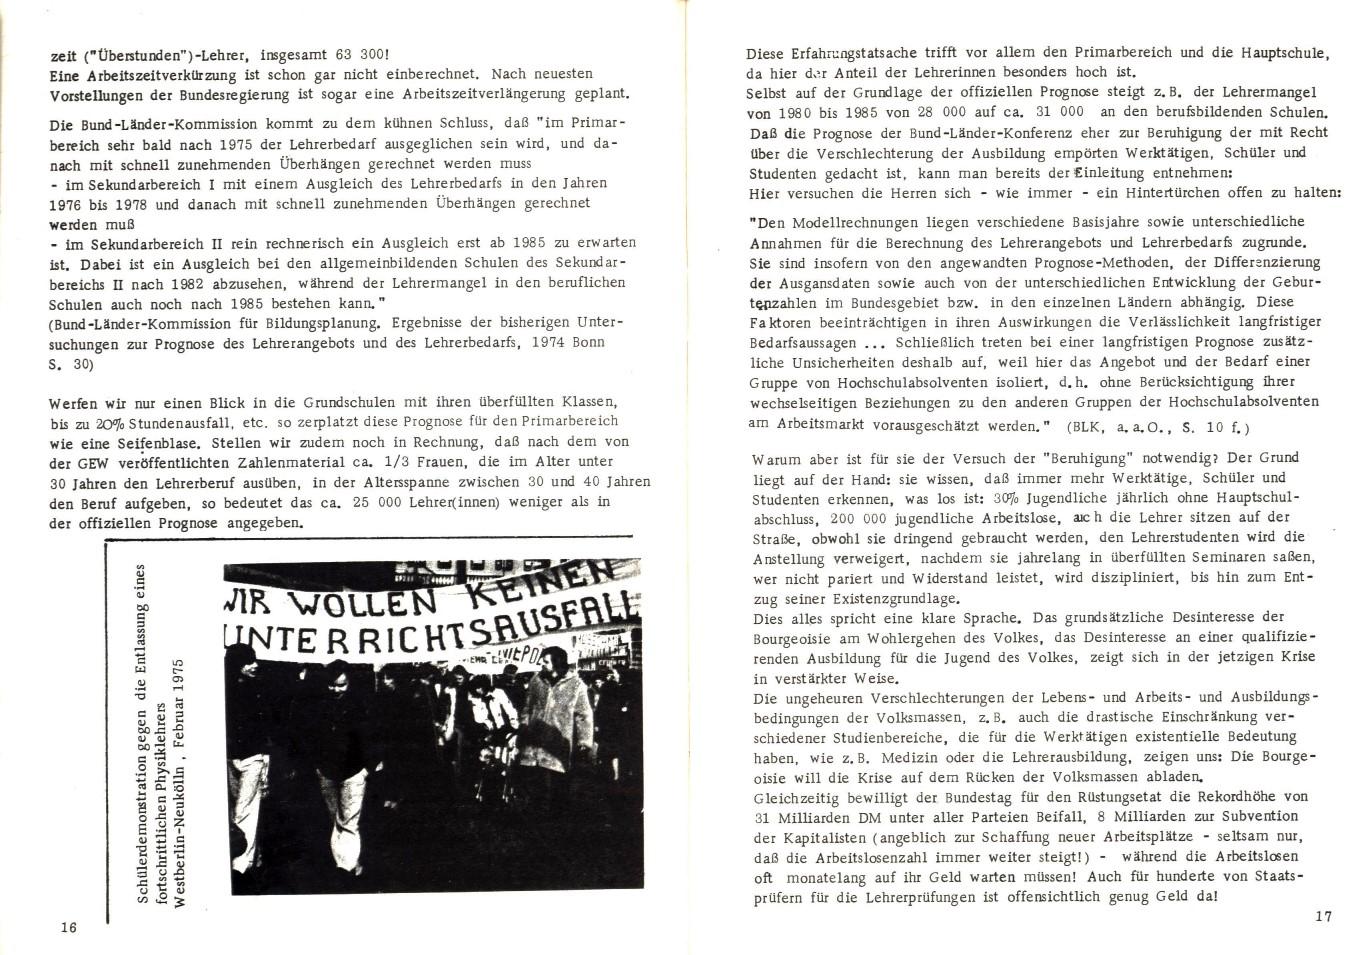 KSV_1975_Lehrerausbildung_09